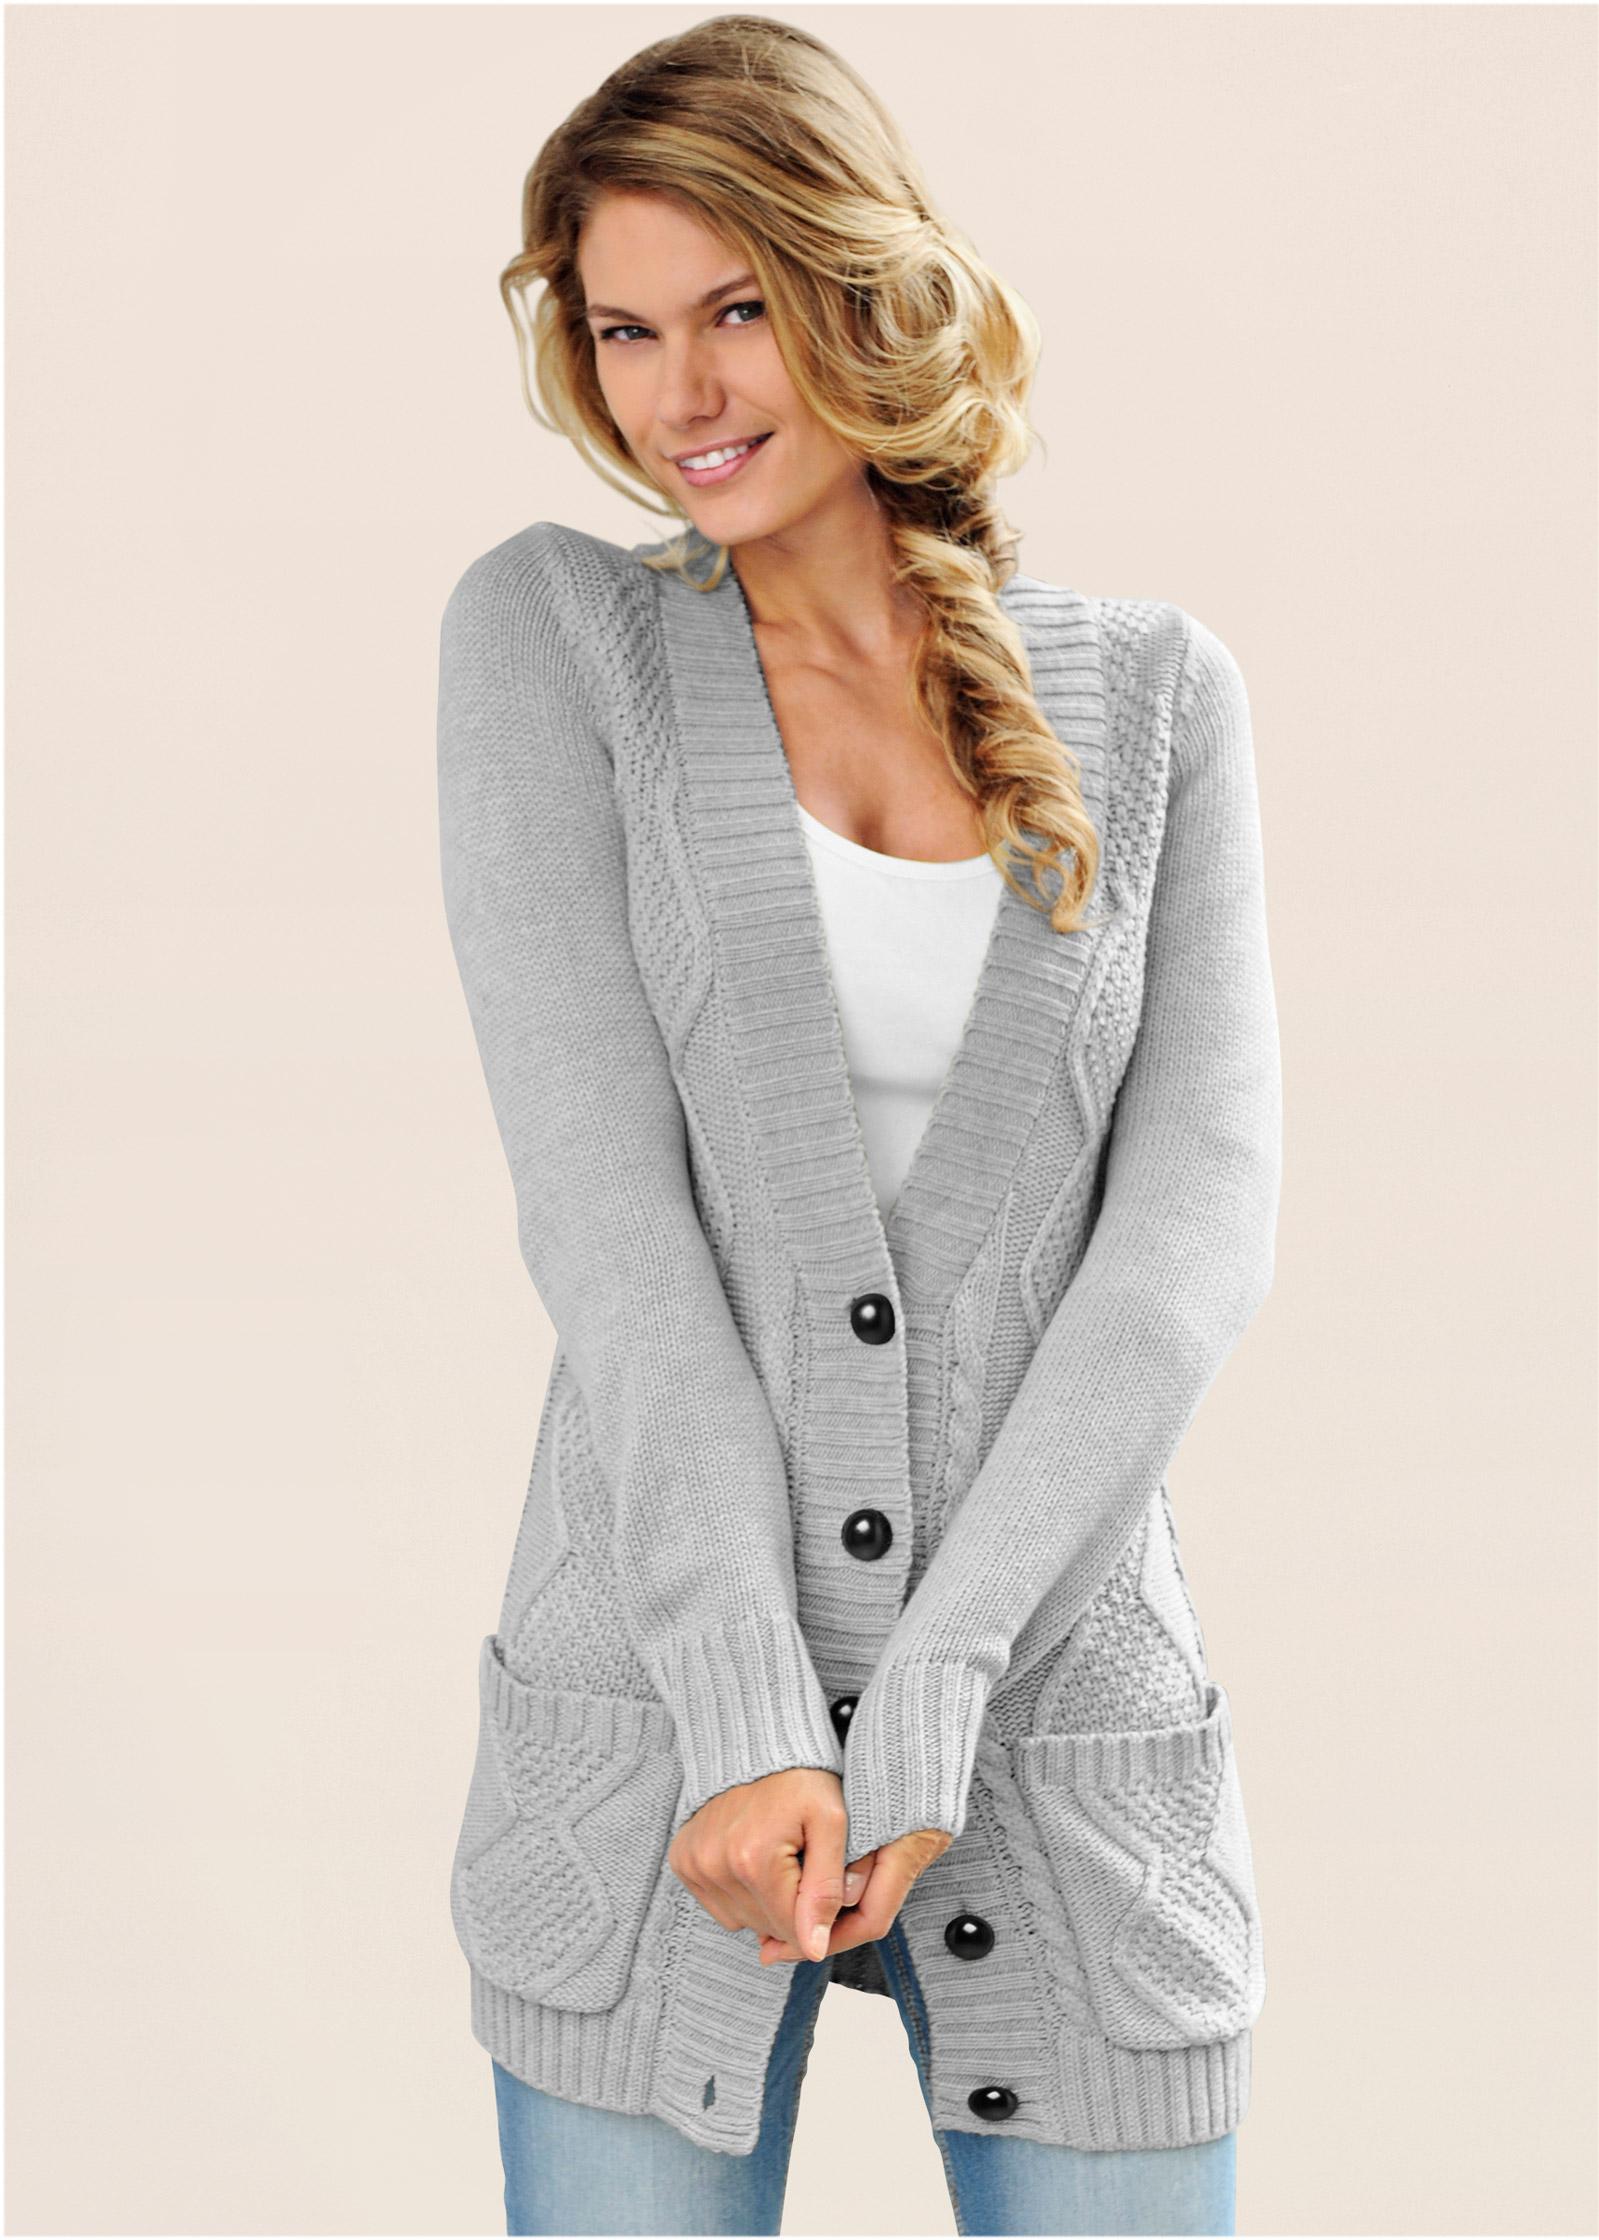 Jacket sweaters womens